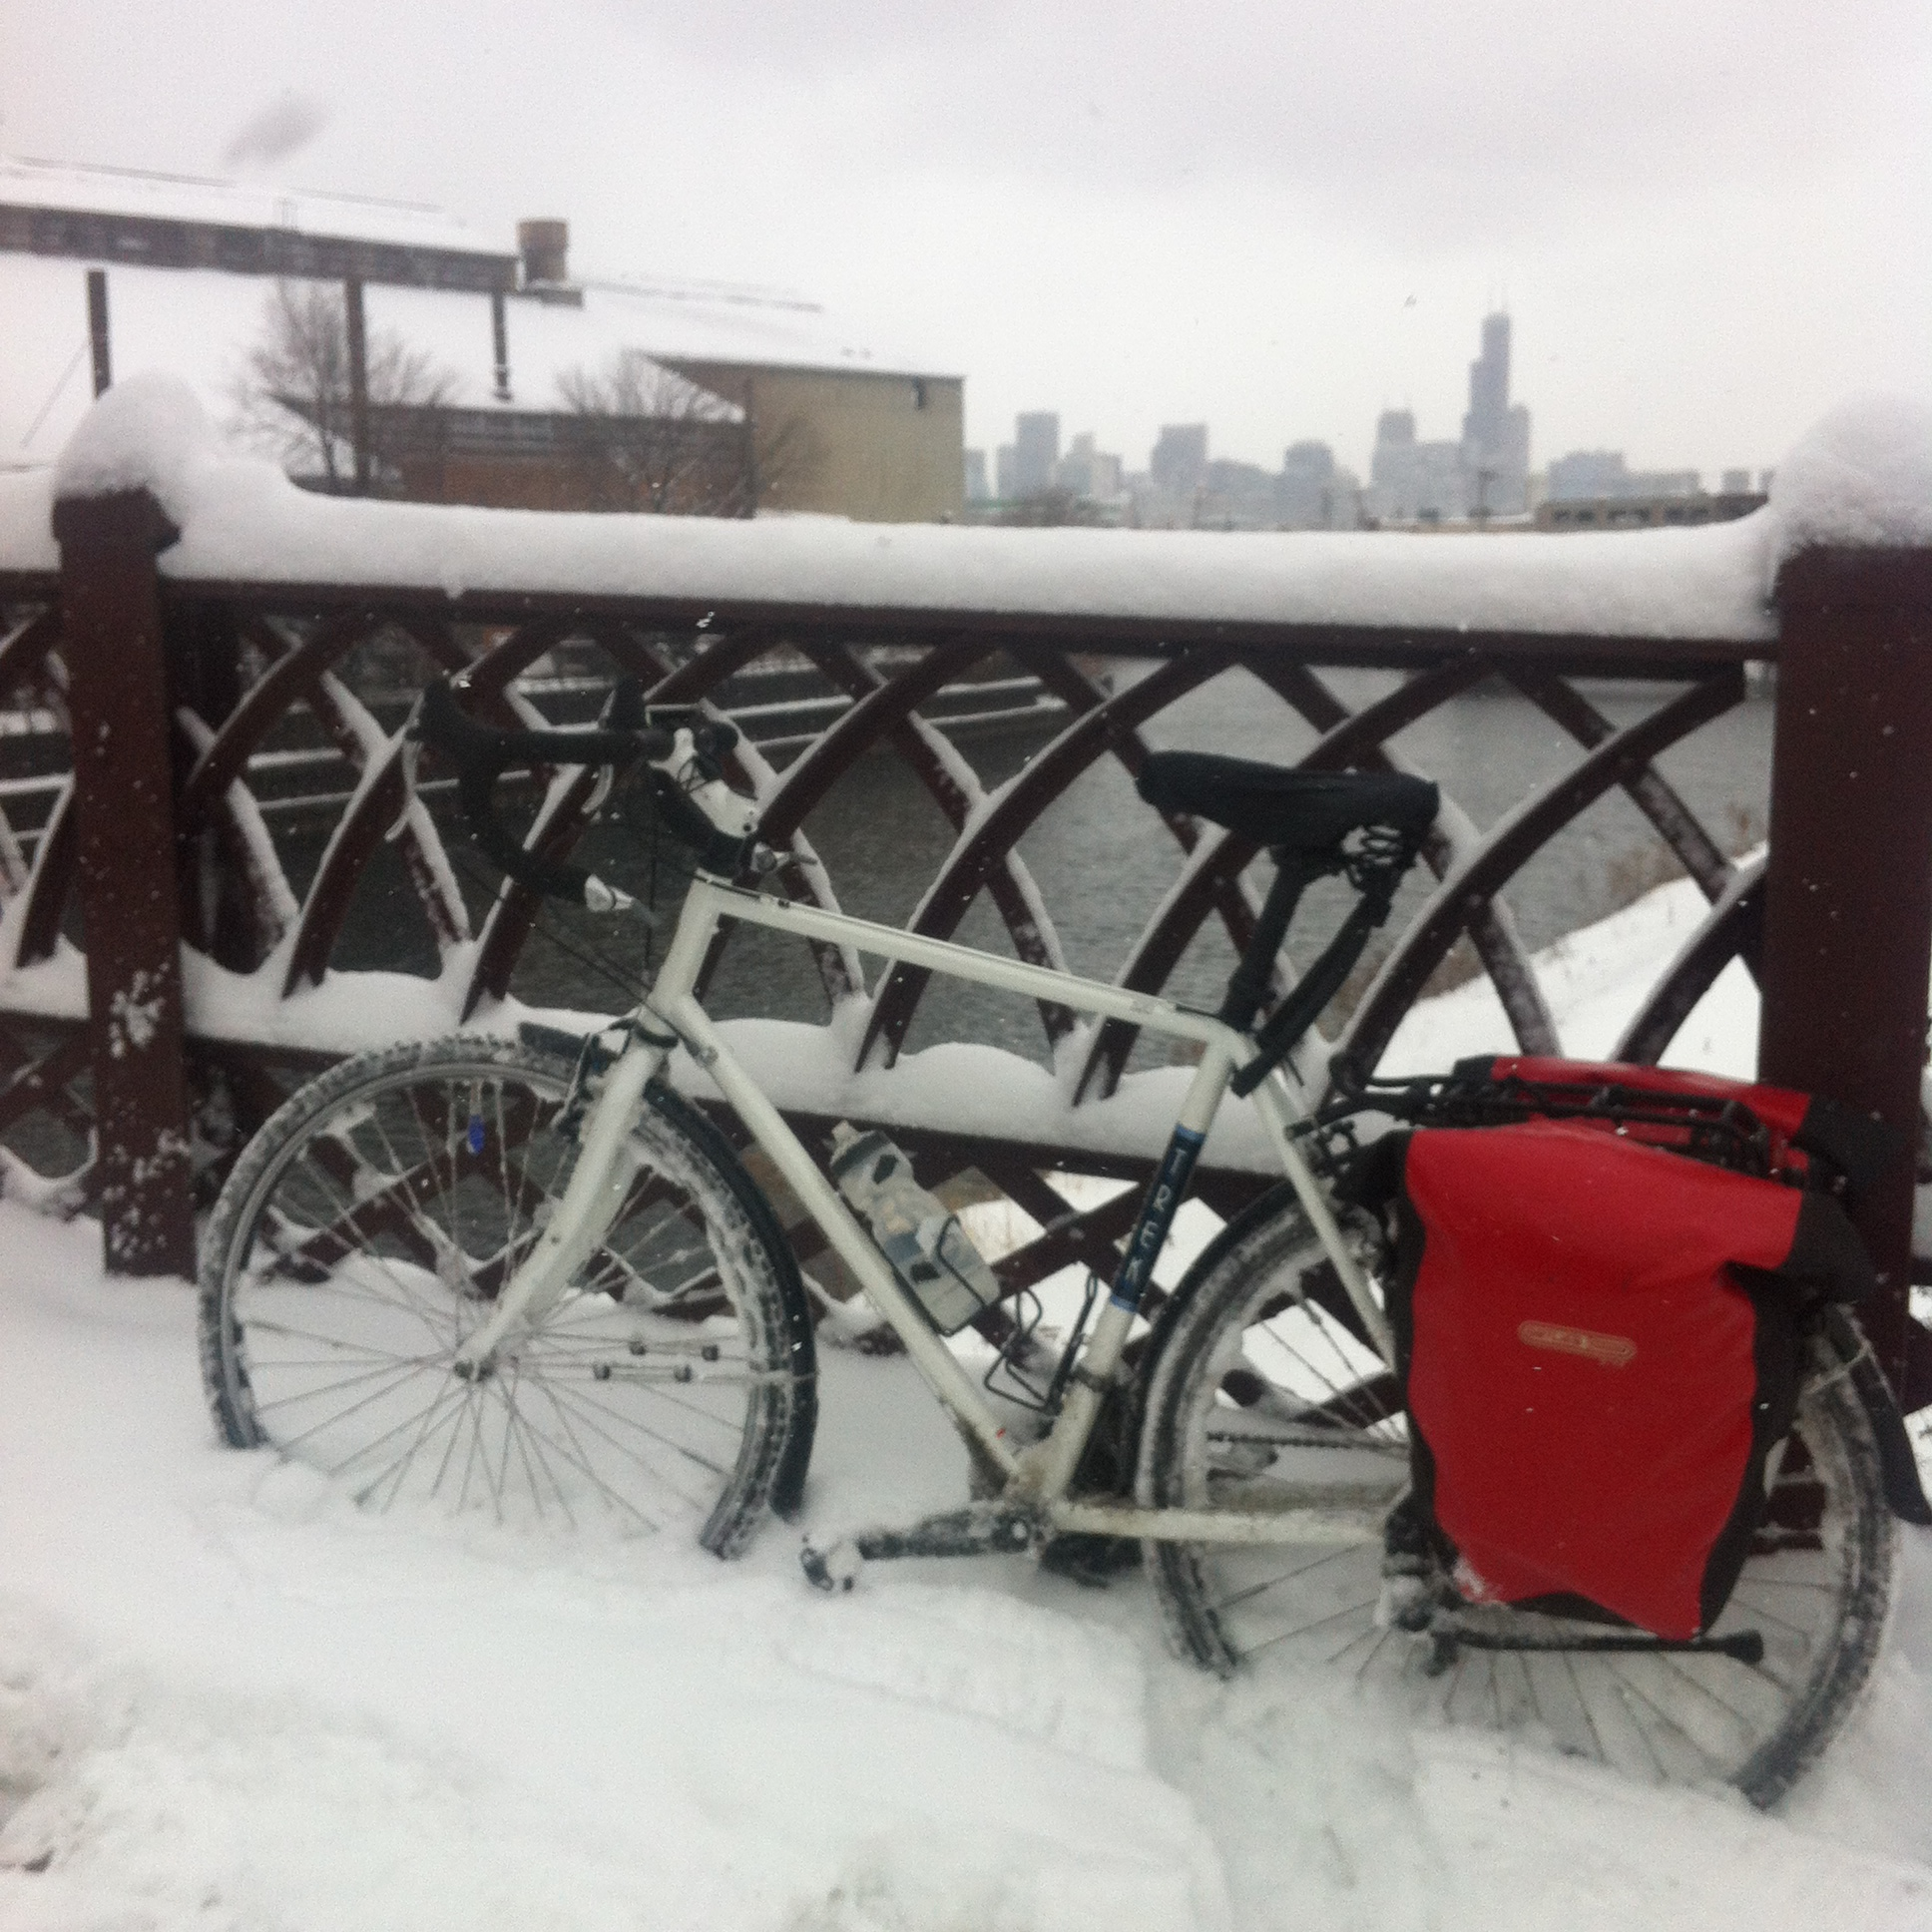 Snow Ride with My Trek Bike 520 - Village Cycle Center